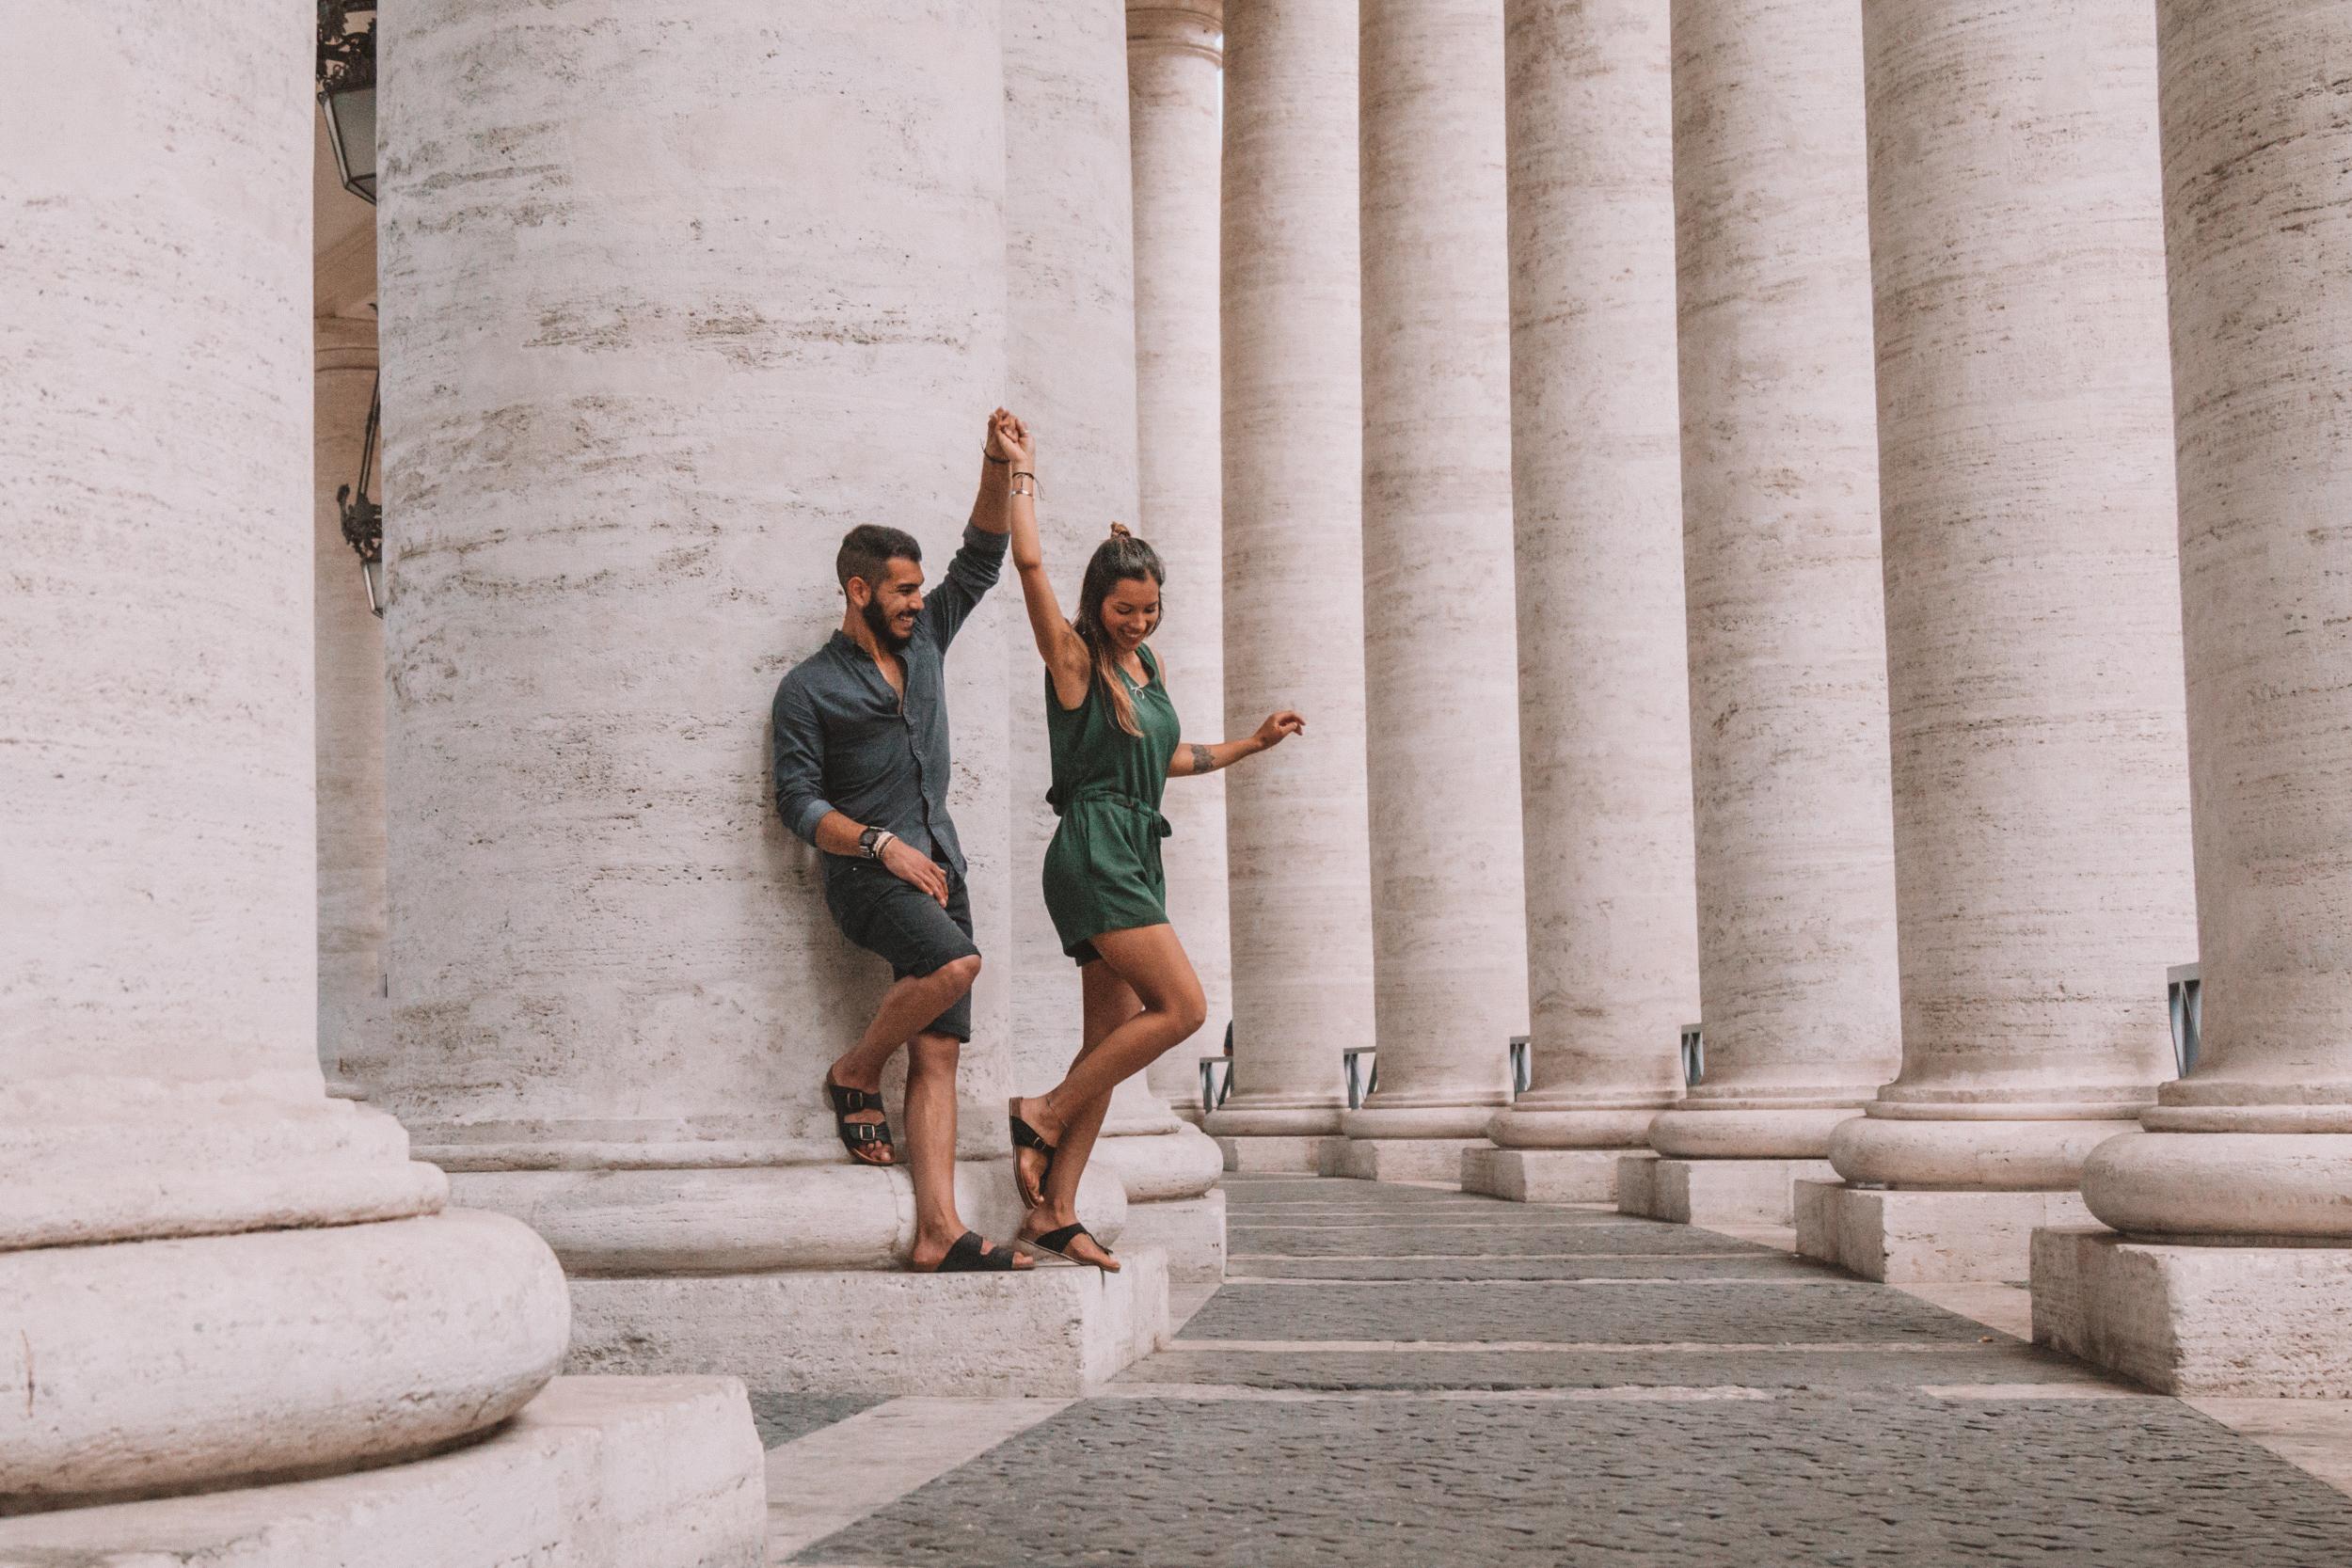 freeoversea dance rome italy shoes nae vegan portuguese brand marcas portuguesas vatican italia travel couple ethical style sustainable fair trade slow fashion